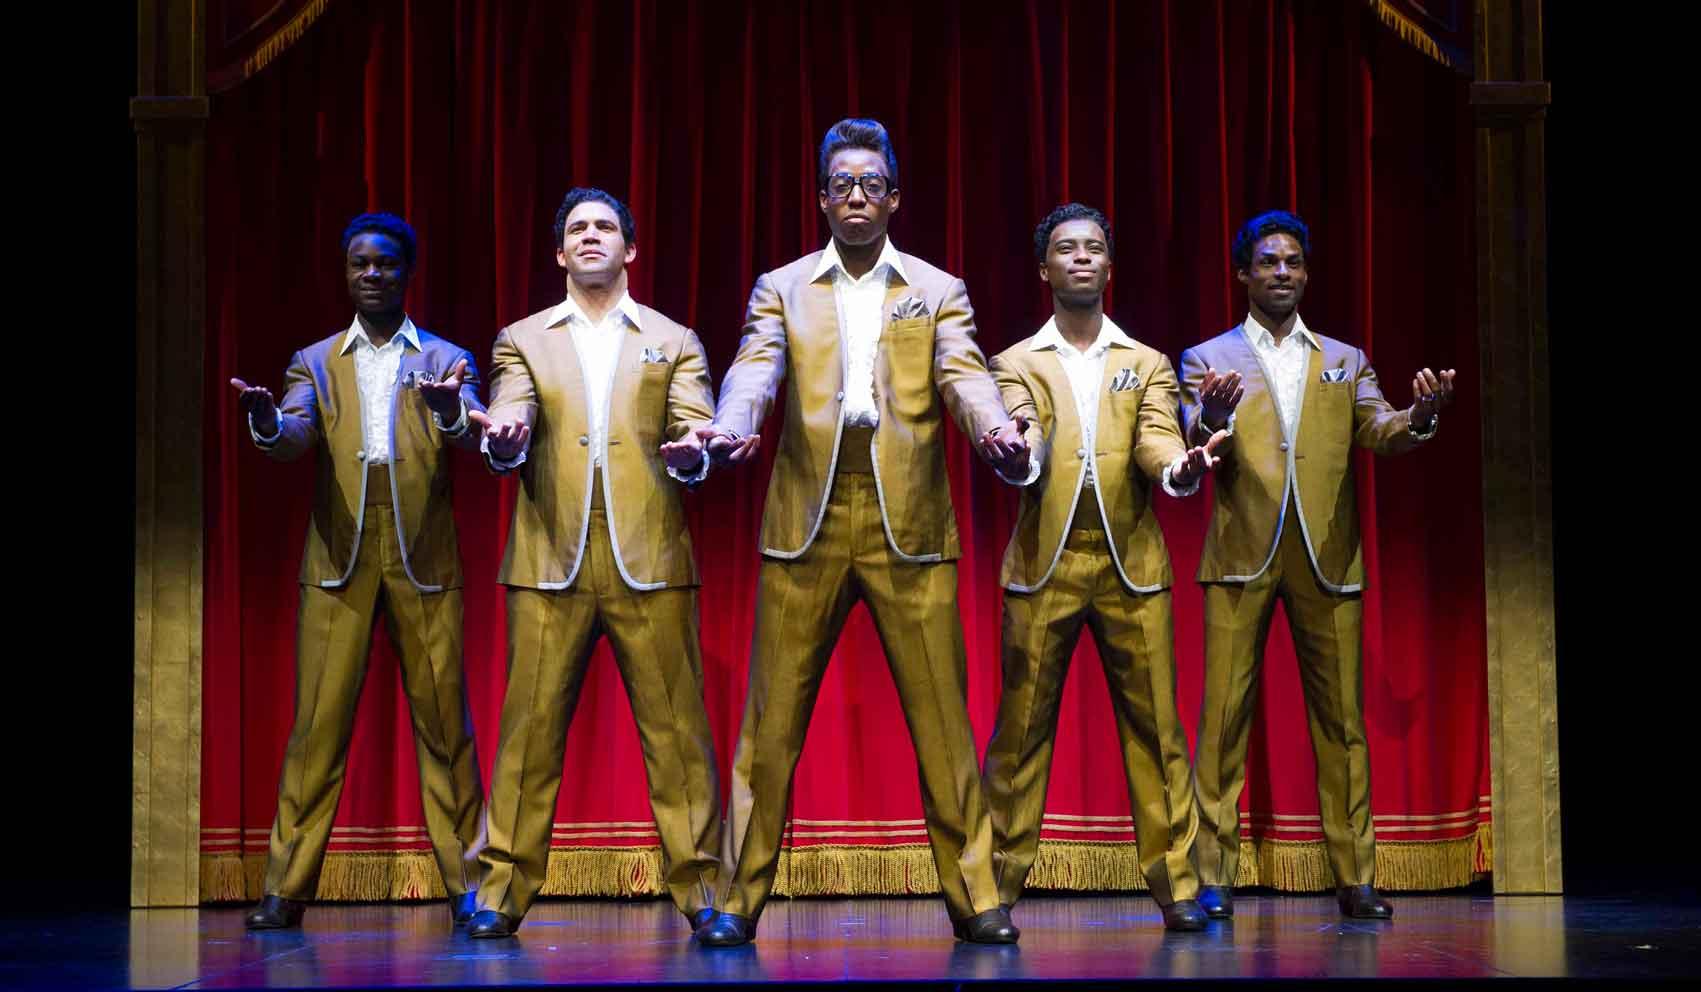 l-r Eddie Elliott, Simon Ray Harvey, Simeon Montague, Joshua Liburd, Brandon Lee Sears as The Temptations in Motown the Musical. Photo: Alastair Muir | First Look: Motown the Musical